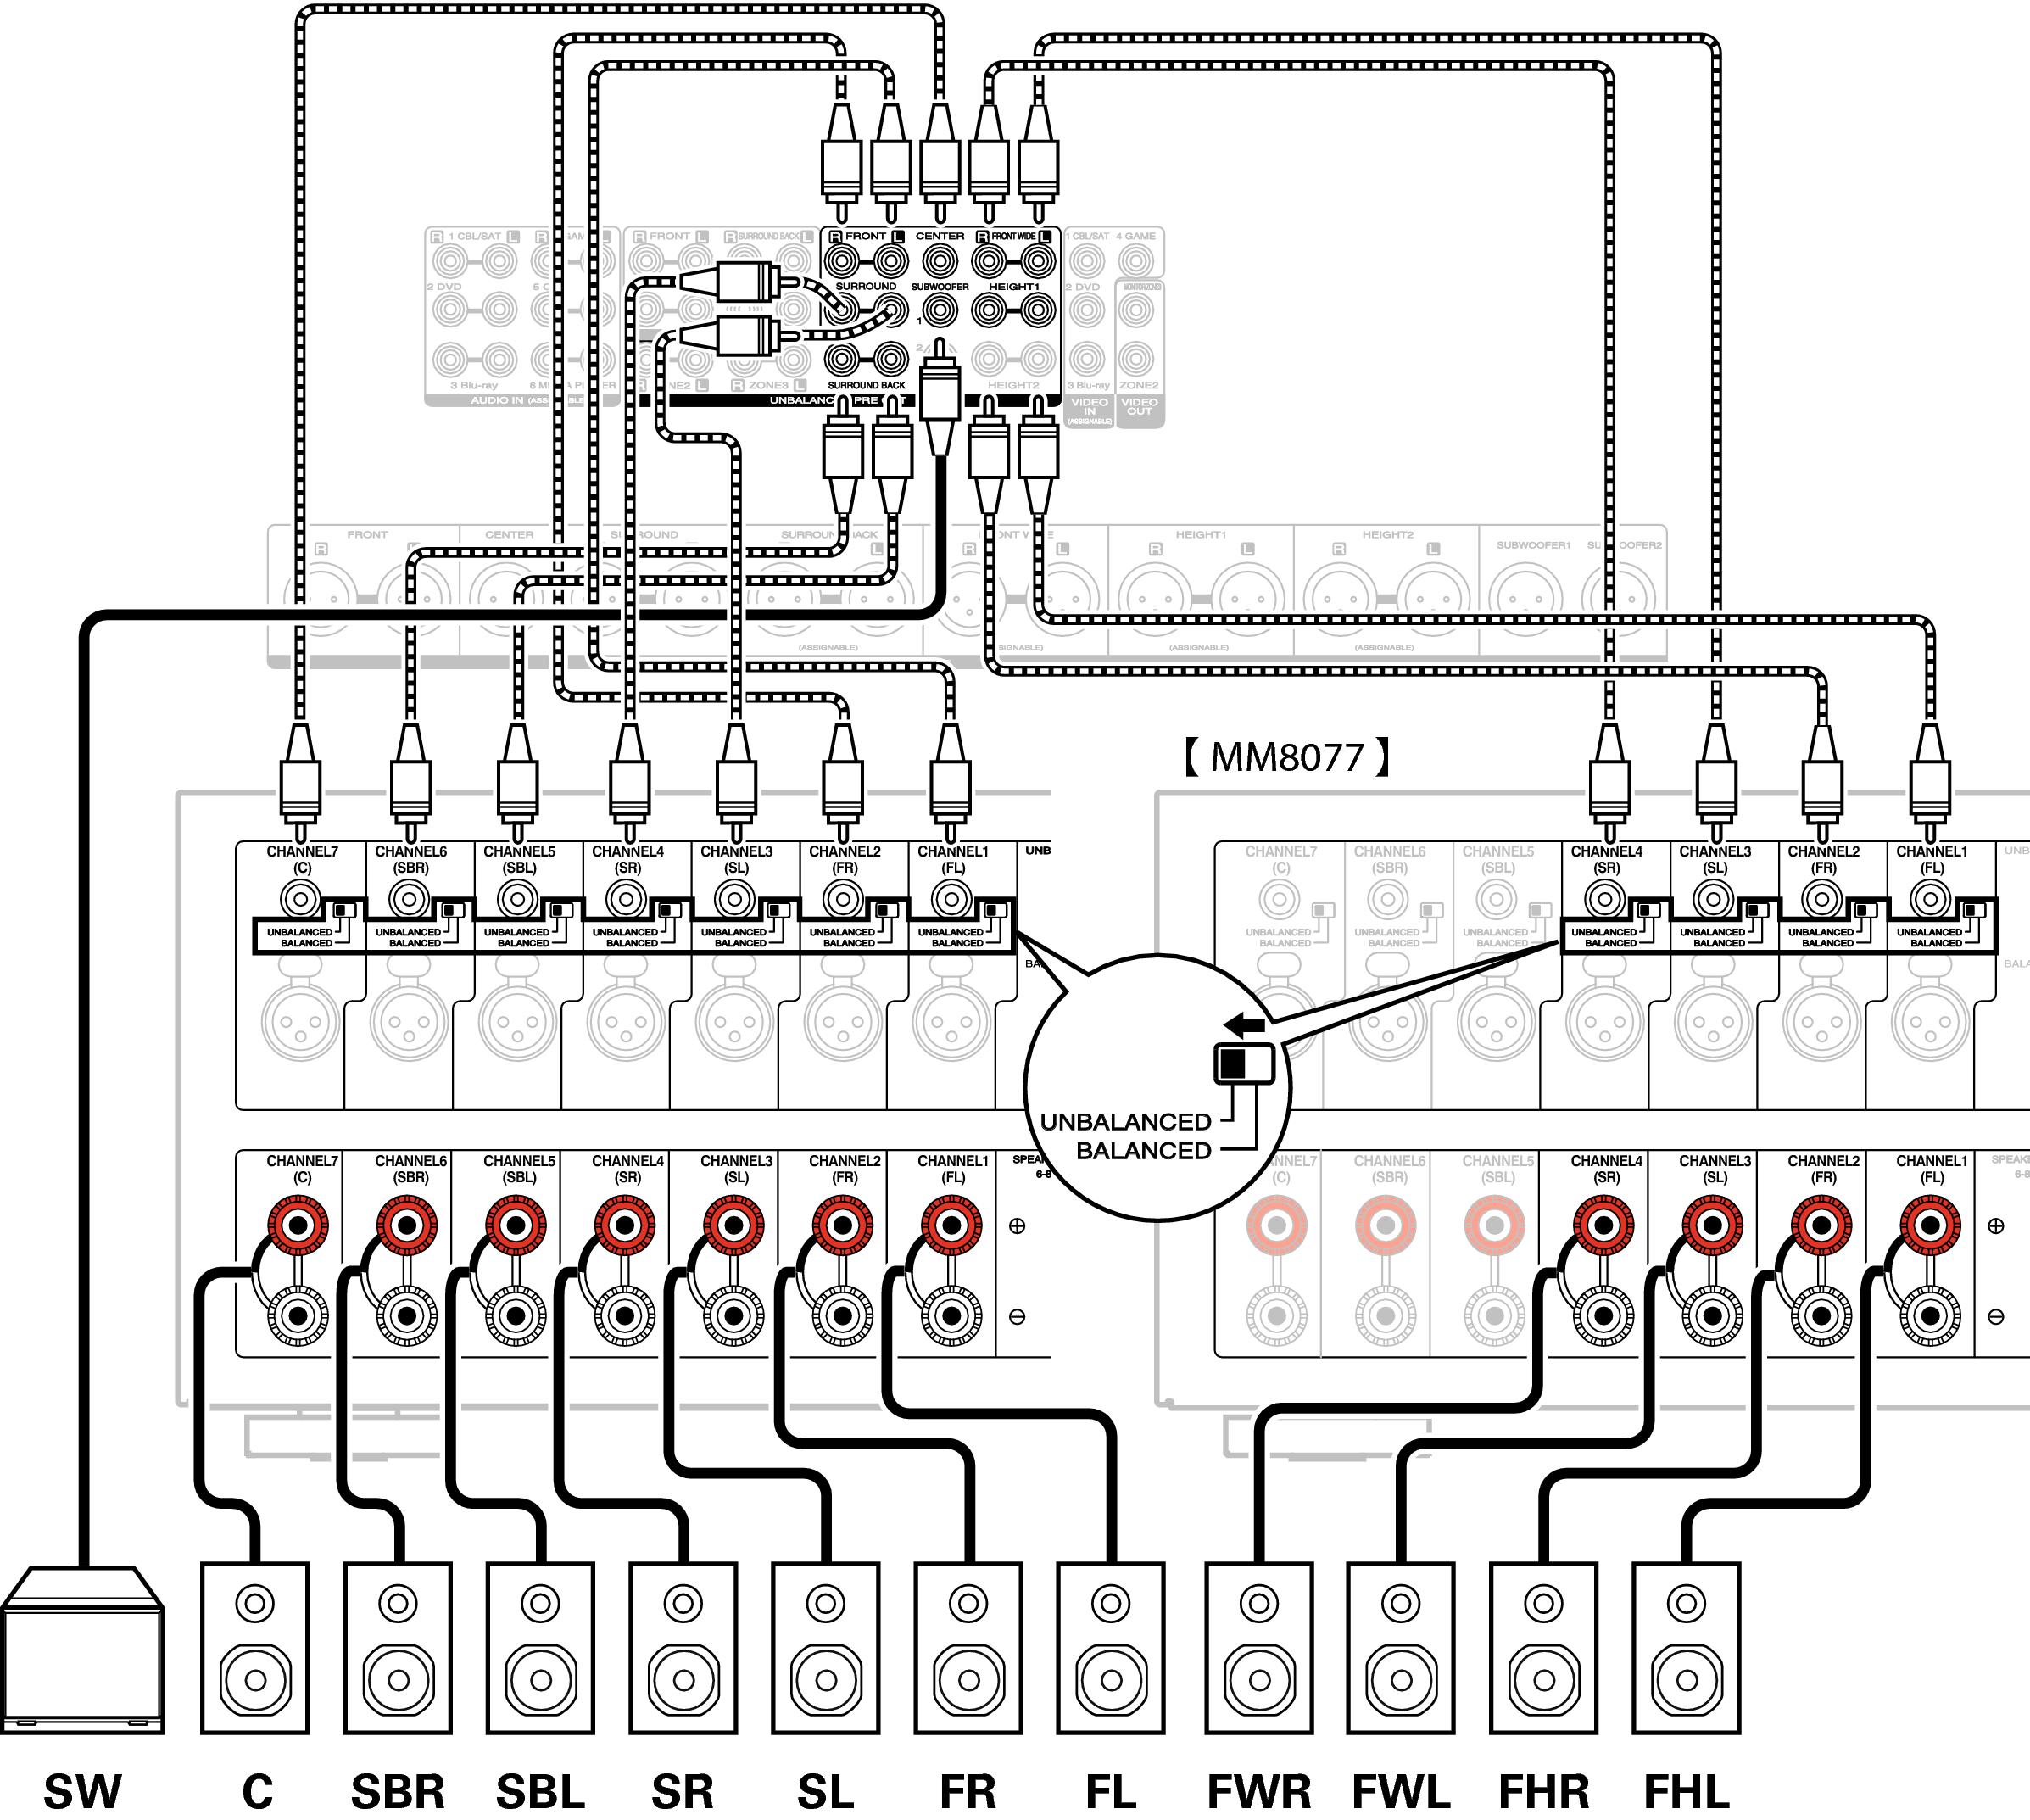 Connecting A Power Amp Av8802 Hdmi Connector Pin Assignment Conne Sp Unbalanced Av8802u